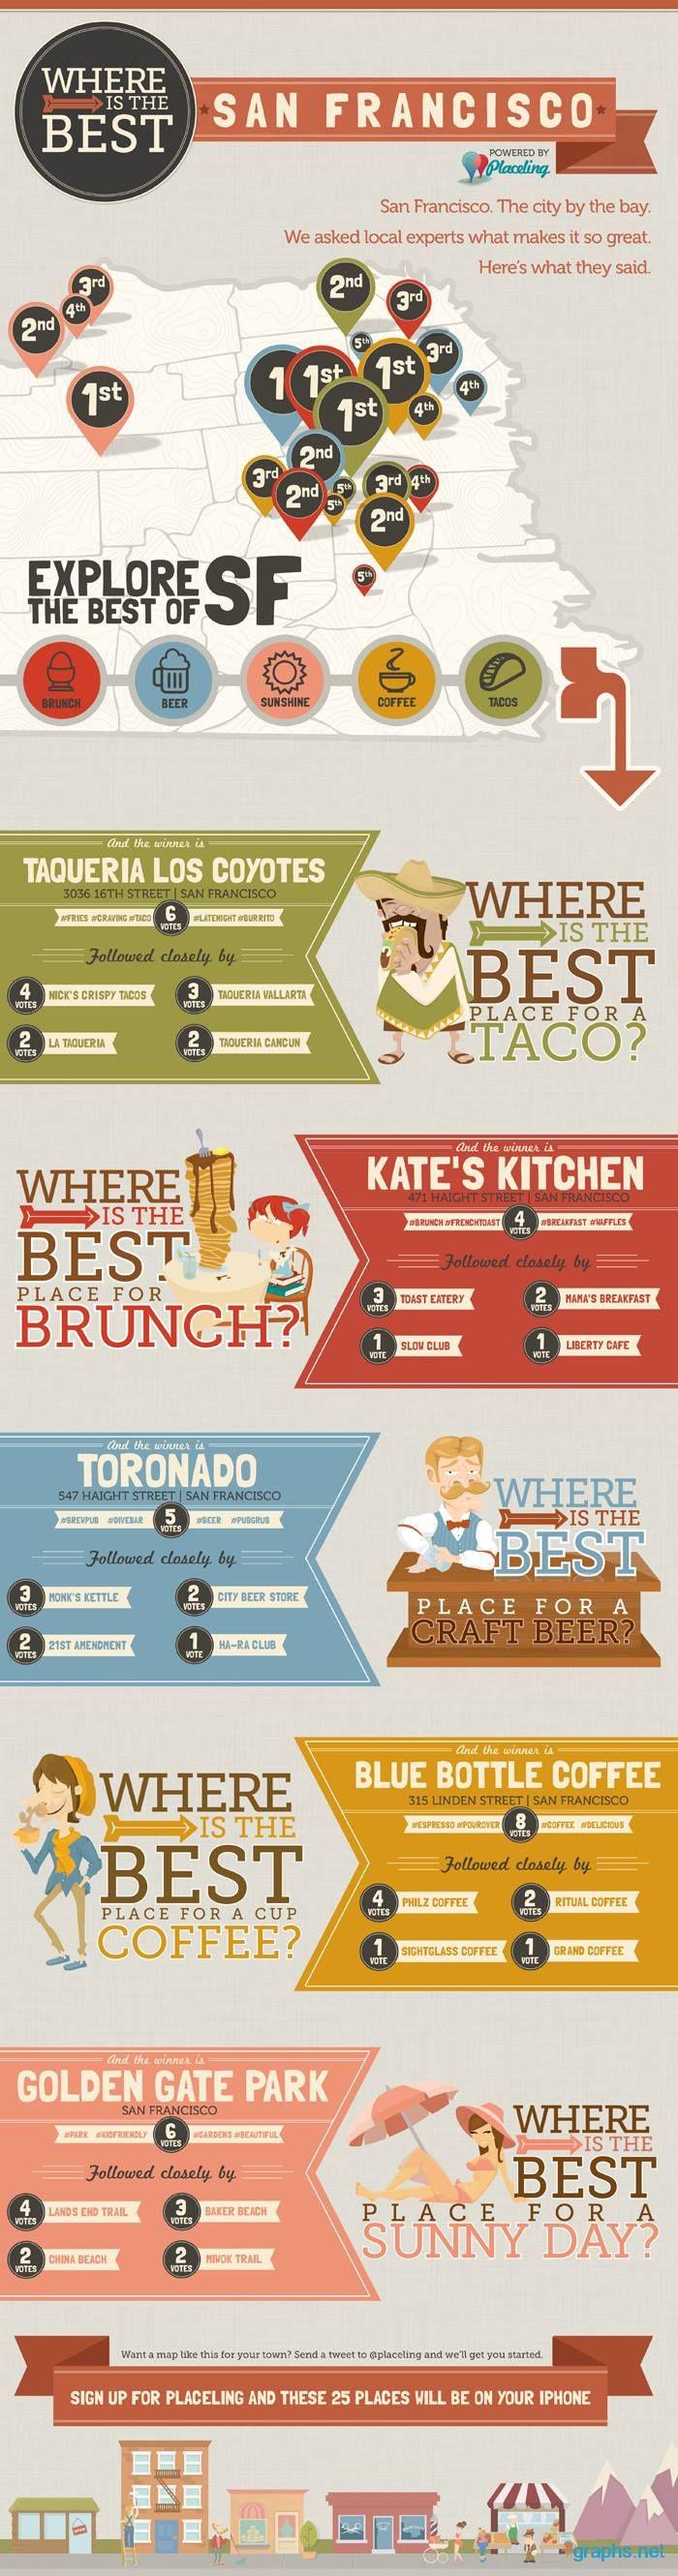 San Fran best spots infographic